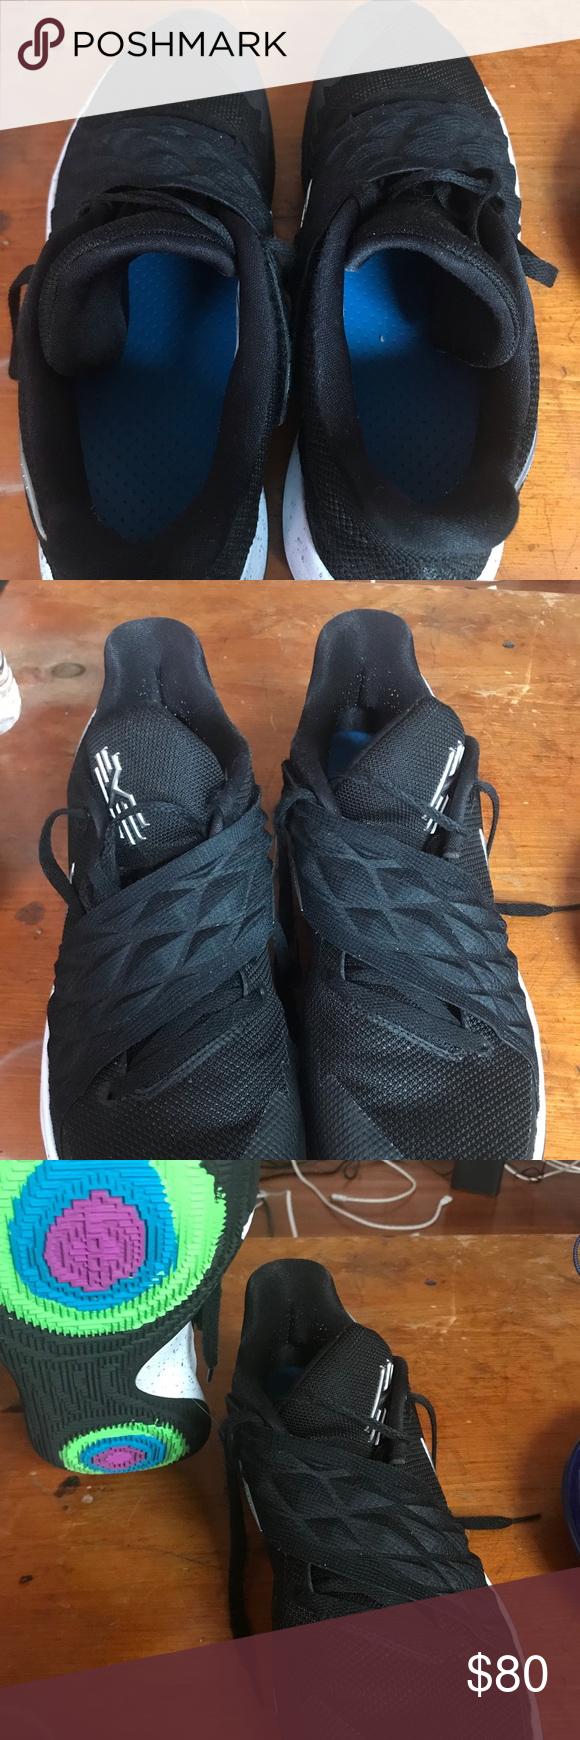 Nike Kyrie Low 1 Black Metallic Silver